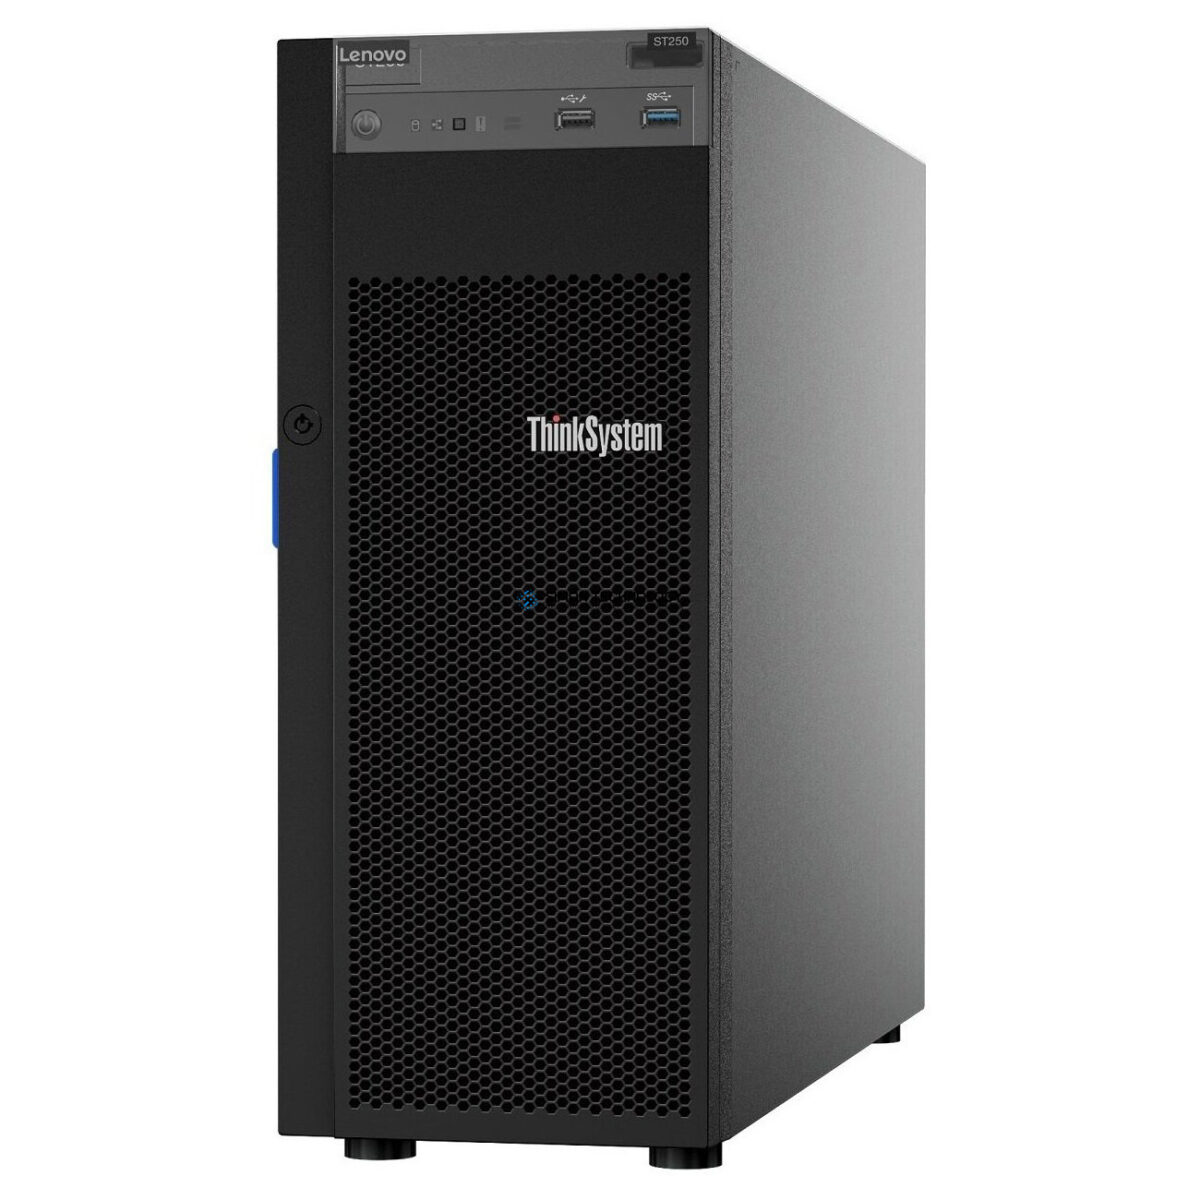 "Сервер Lenovo ThinkSystem ST250 Xeon E-2224 4C/16GB/2,5""/MB/550W (7Y46A04JEA)"